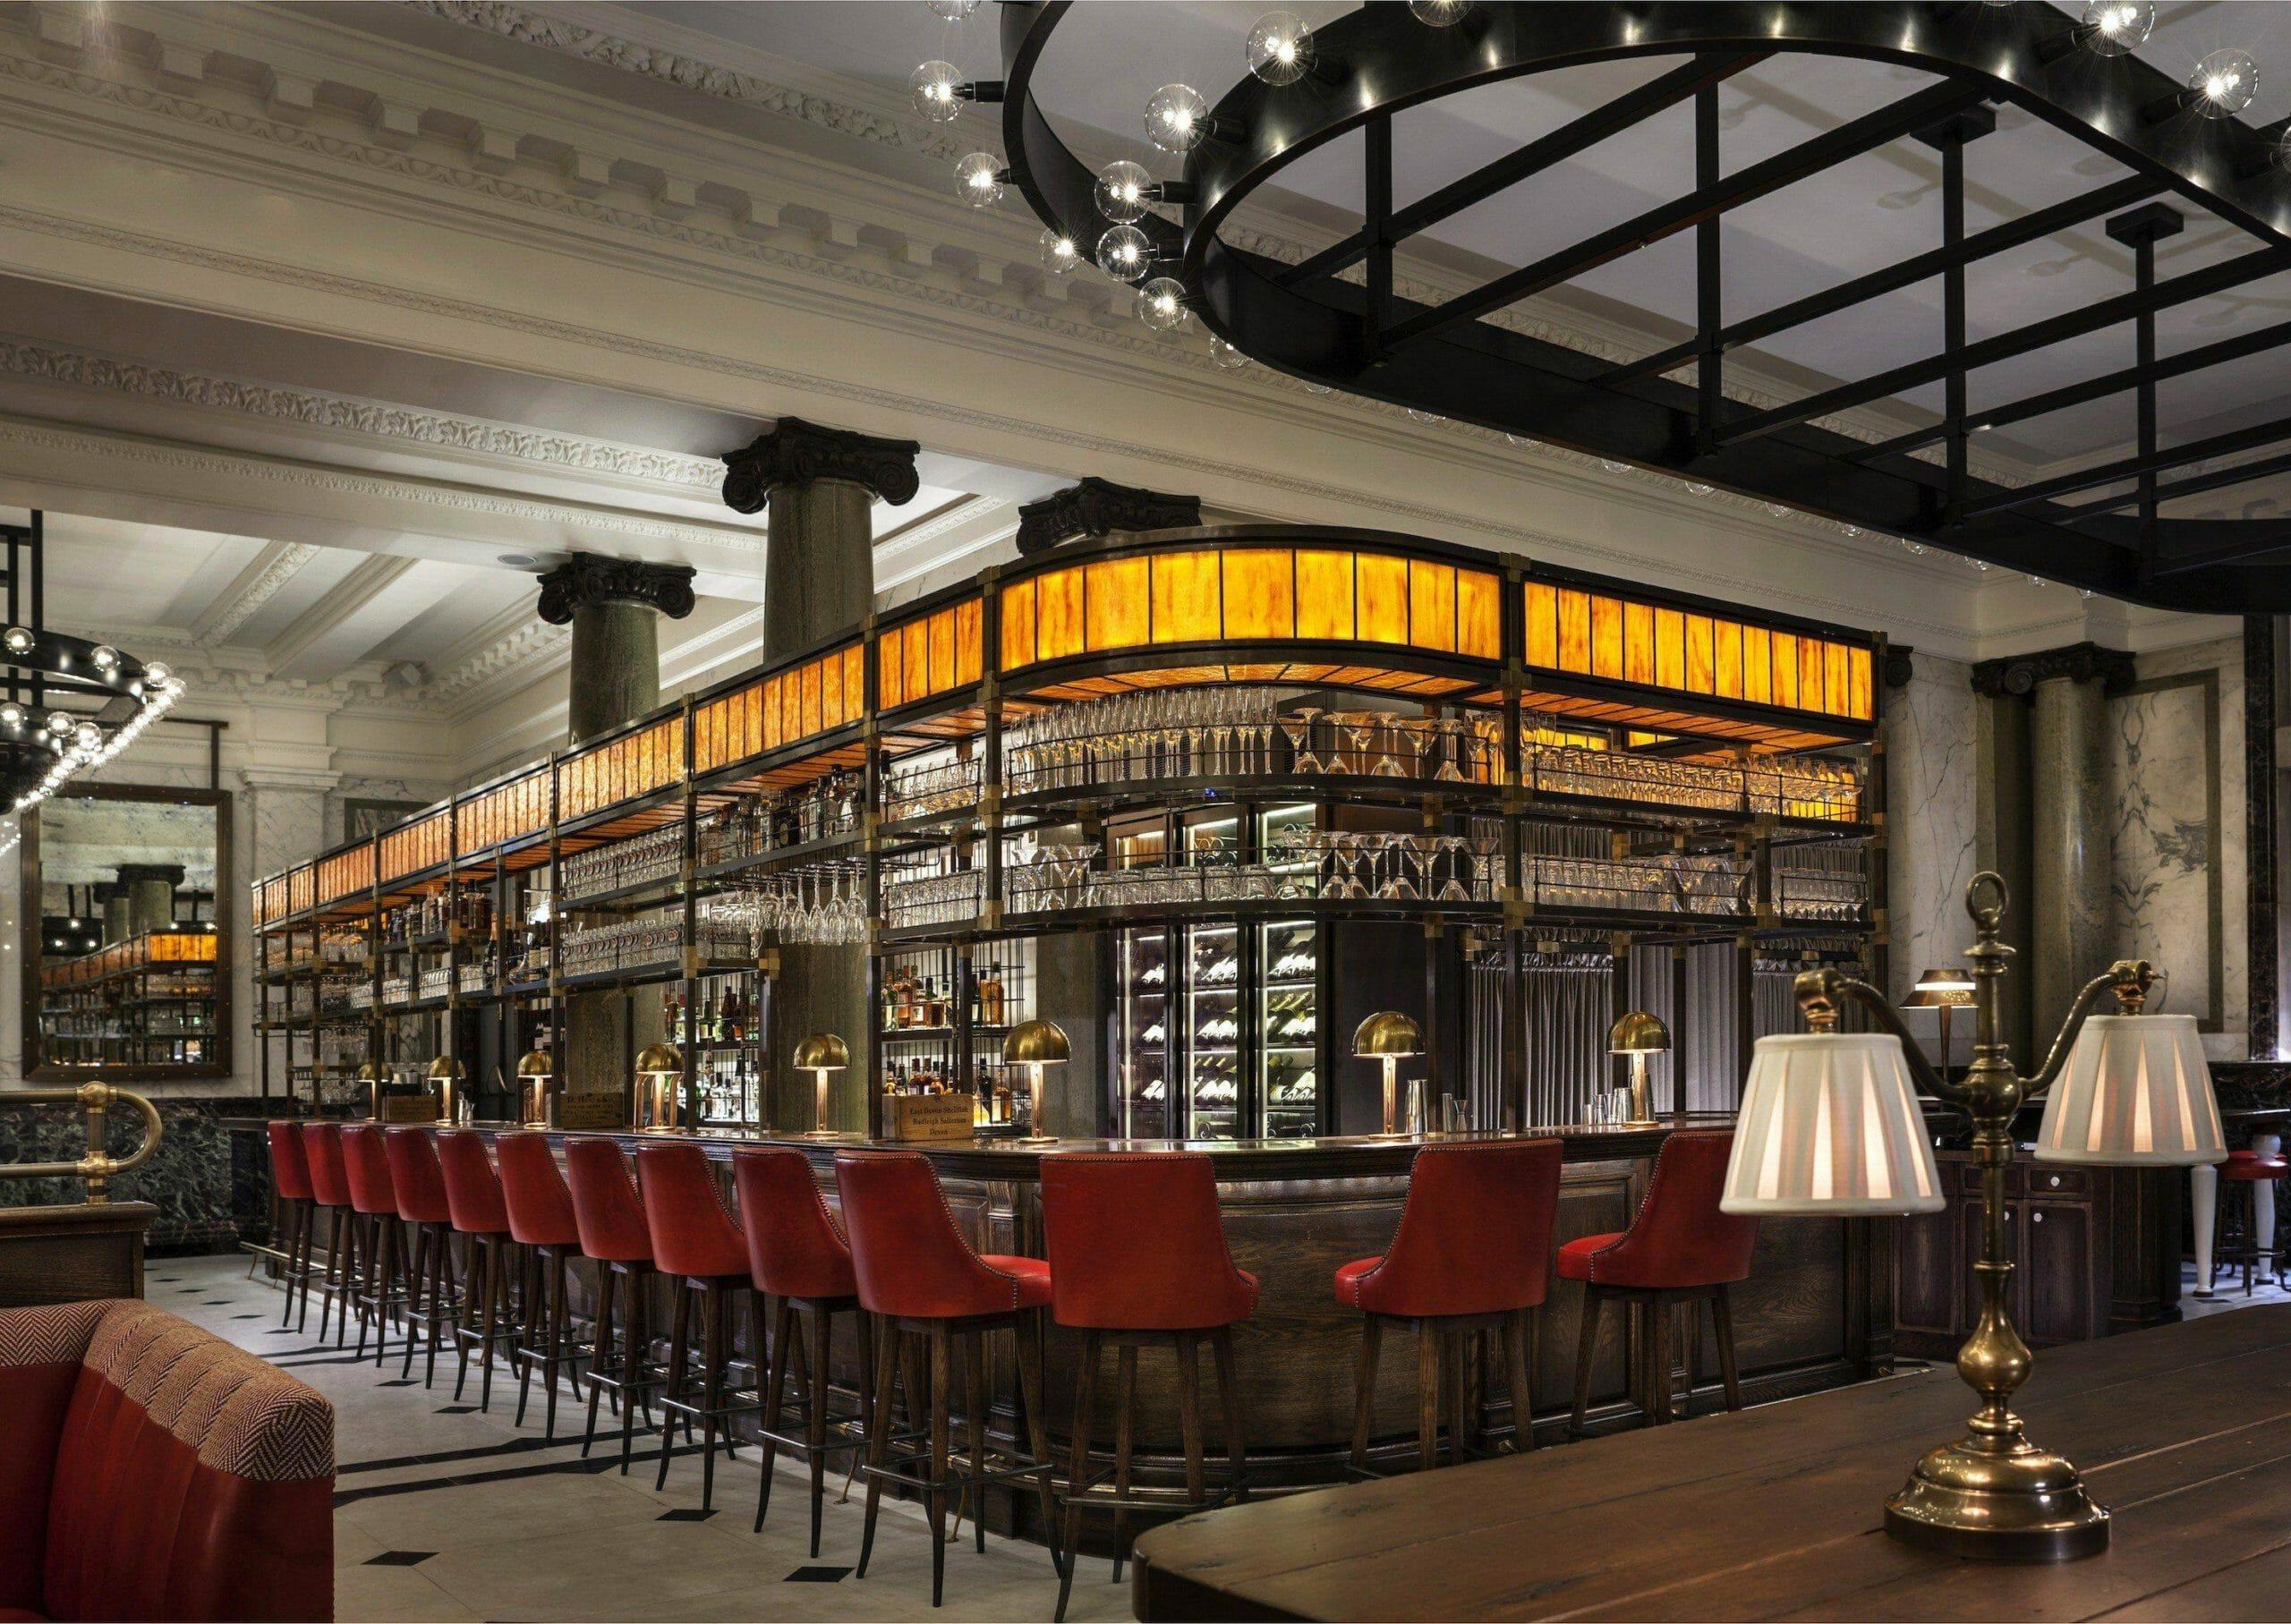 Holborn Dining Room gin bar London